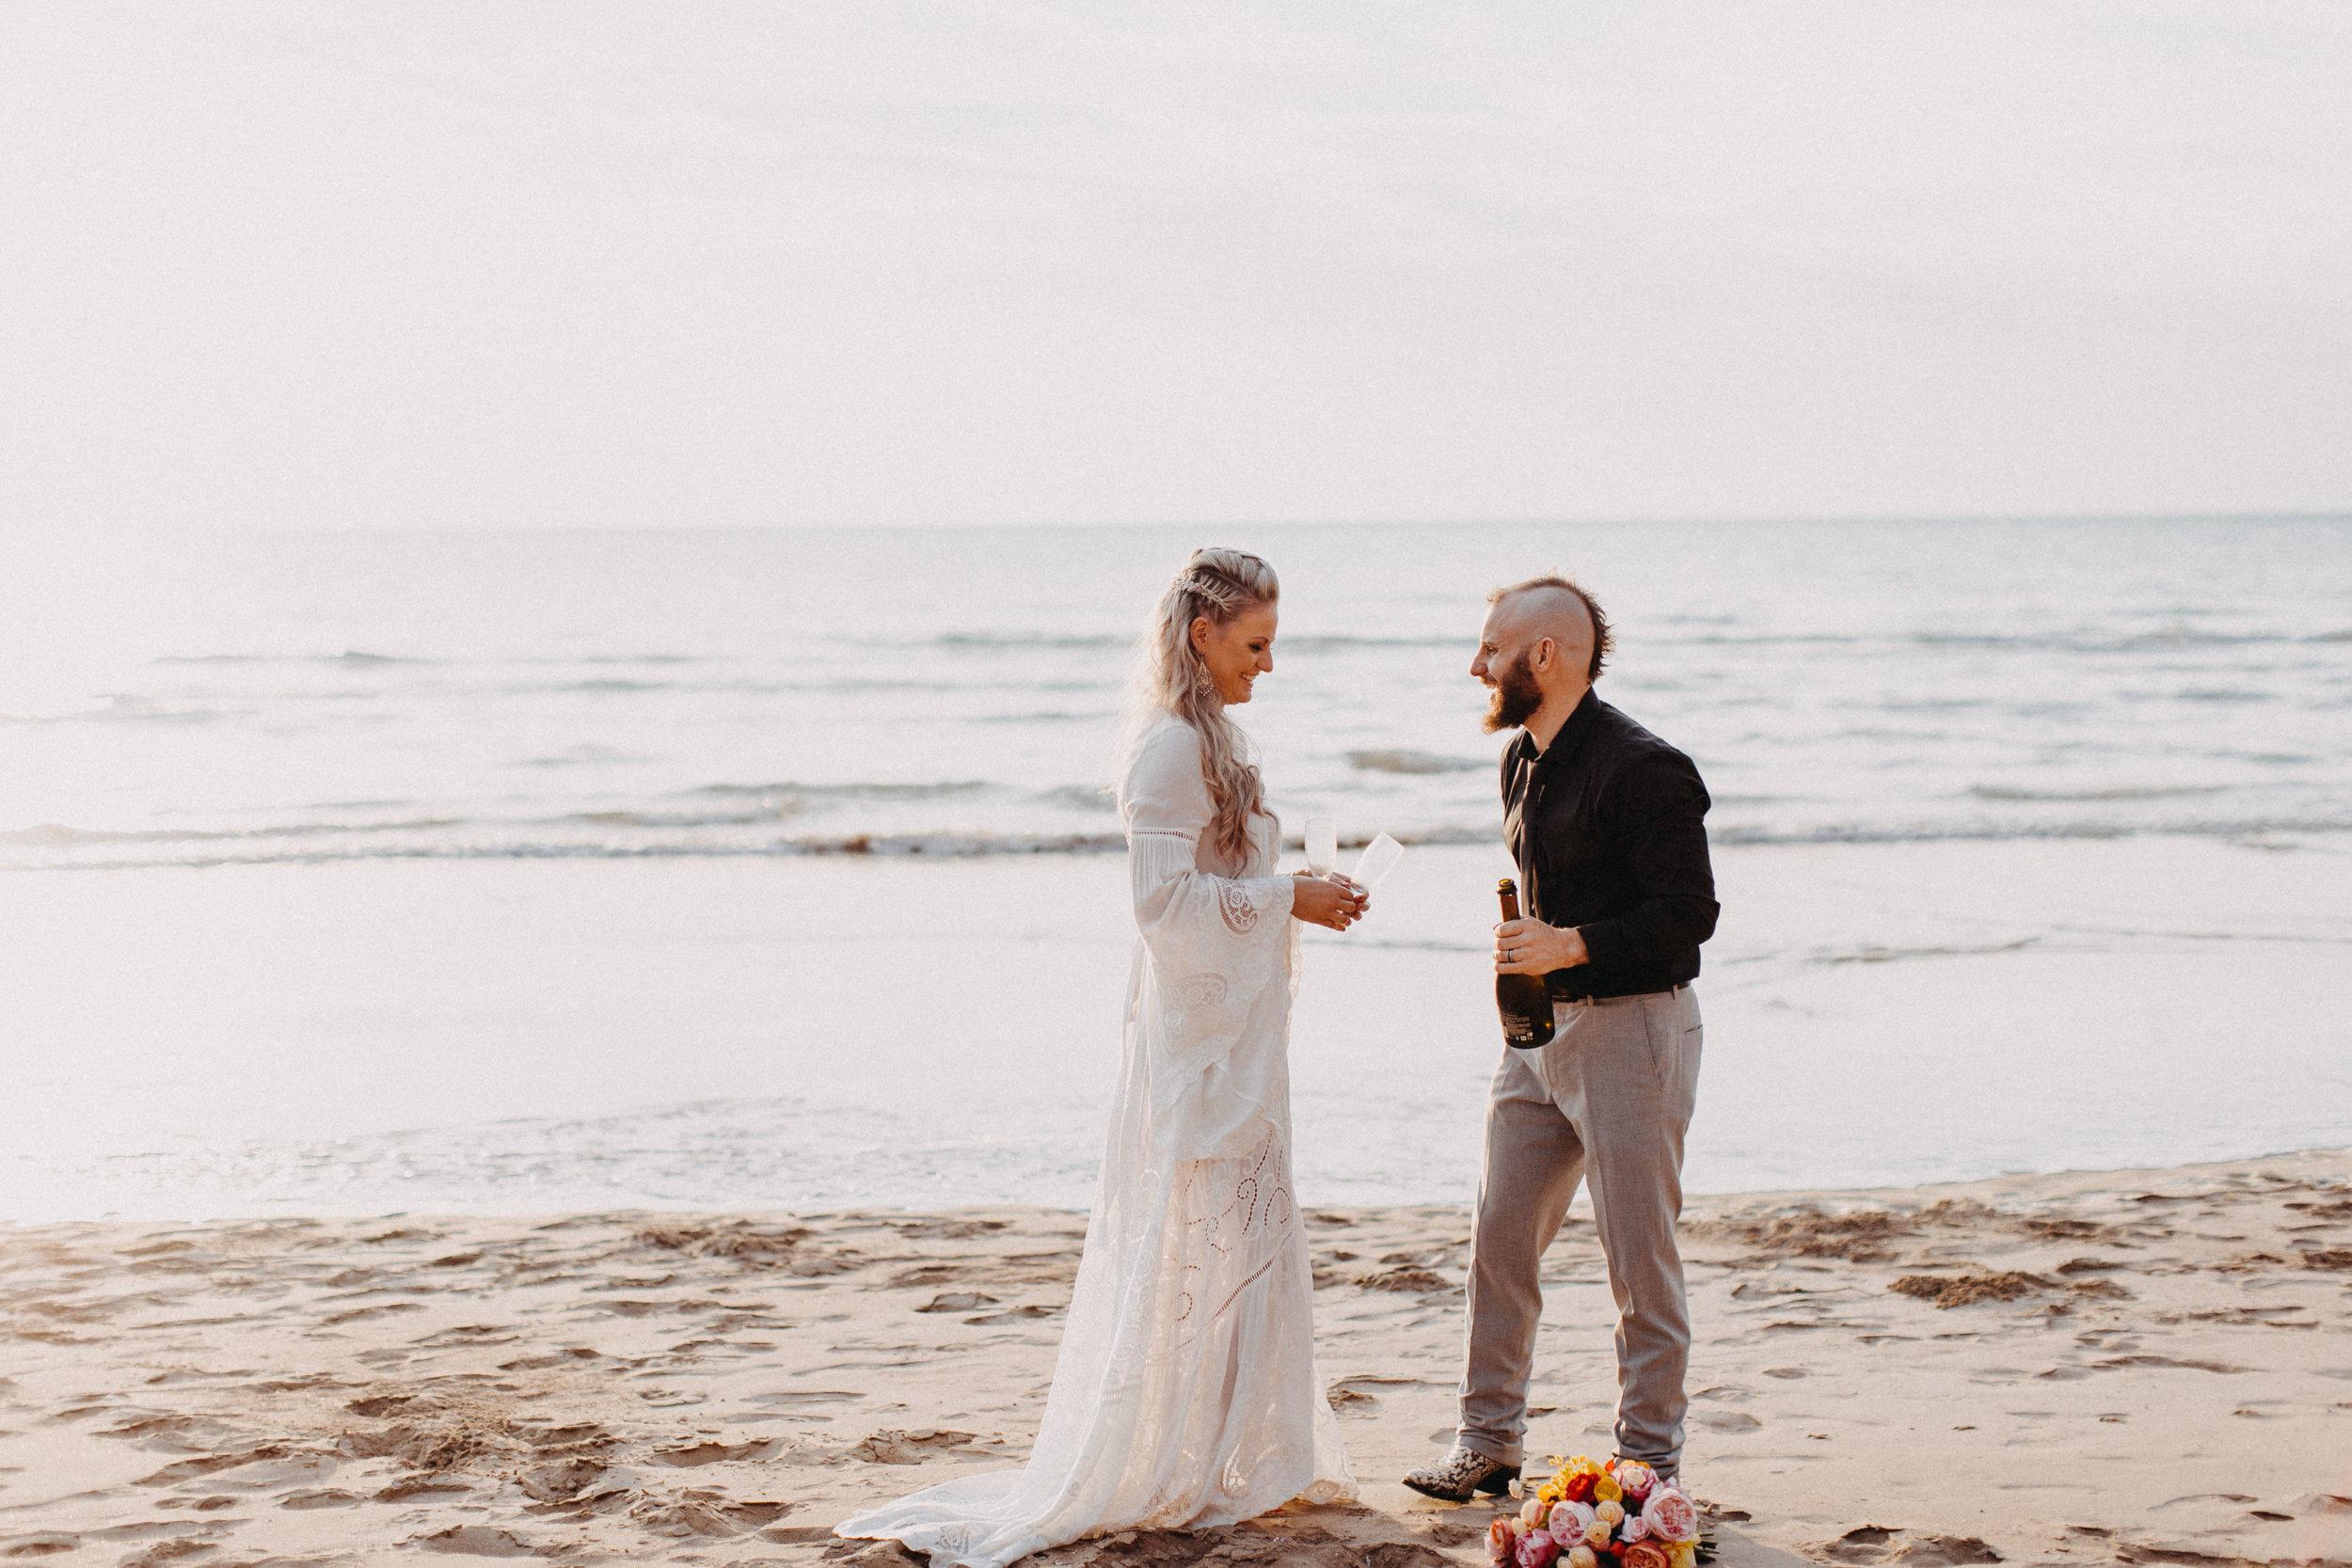 darwin-elopement-wedding-beach-camden-photography-www.emilyobrienphotography.net-63.jpg